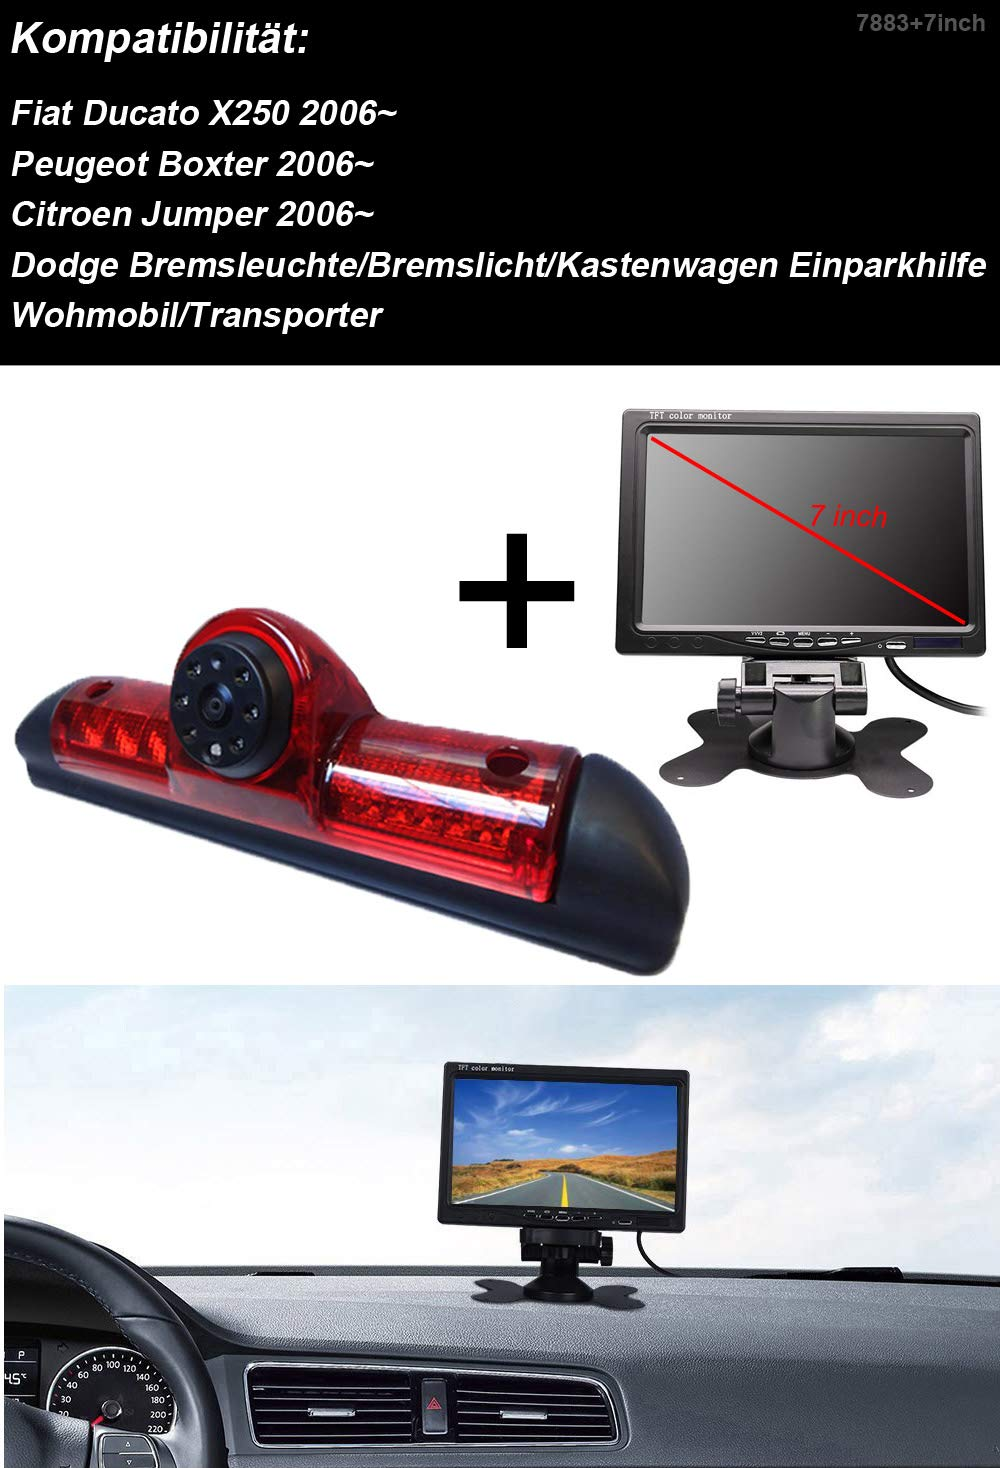 Klakus-Auto-Dach-Top-Mount-Bremsleuchte-Kamera-Bremslicht-Rckfahrkamera-fr-Fiat-DucatoPeugeot-BoxerCitroen-JumperDodge7Zoll-DVD-Monitor-TFT-Bildschirm-LKW-KFZ-LCD-Display